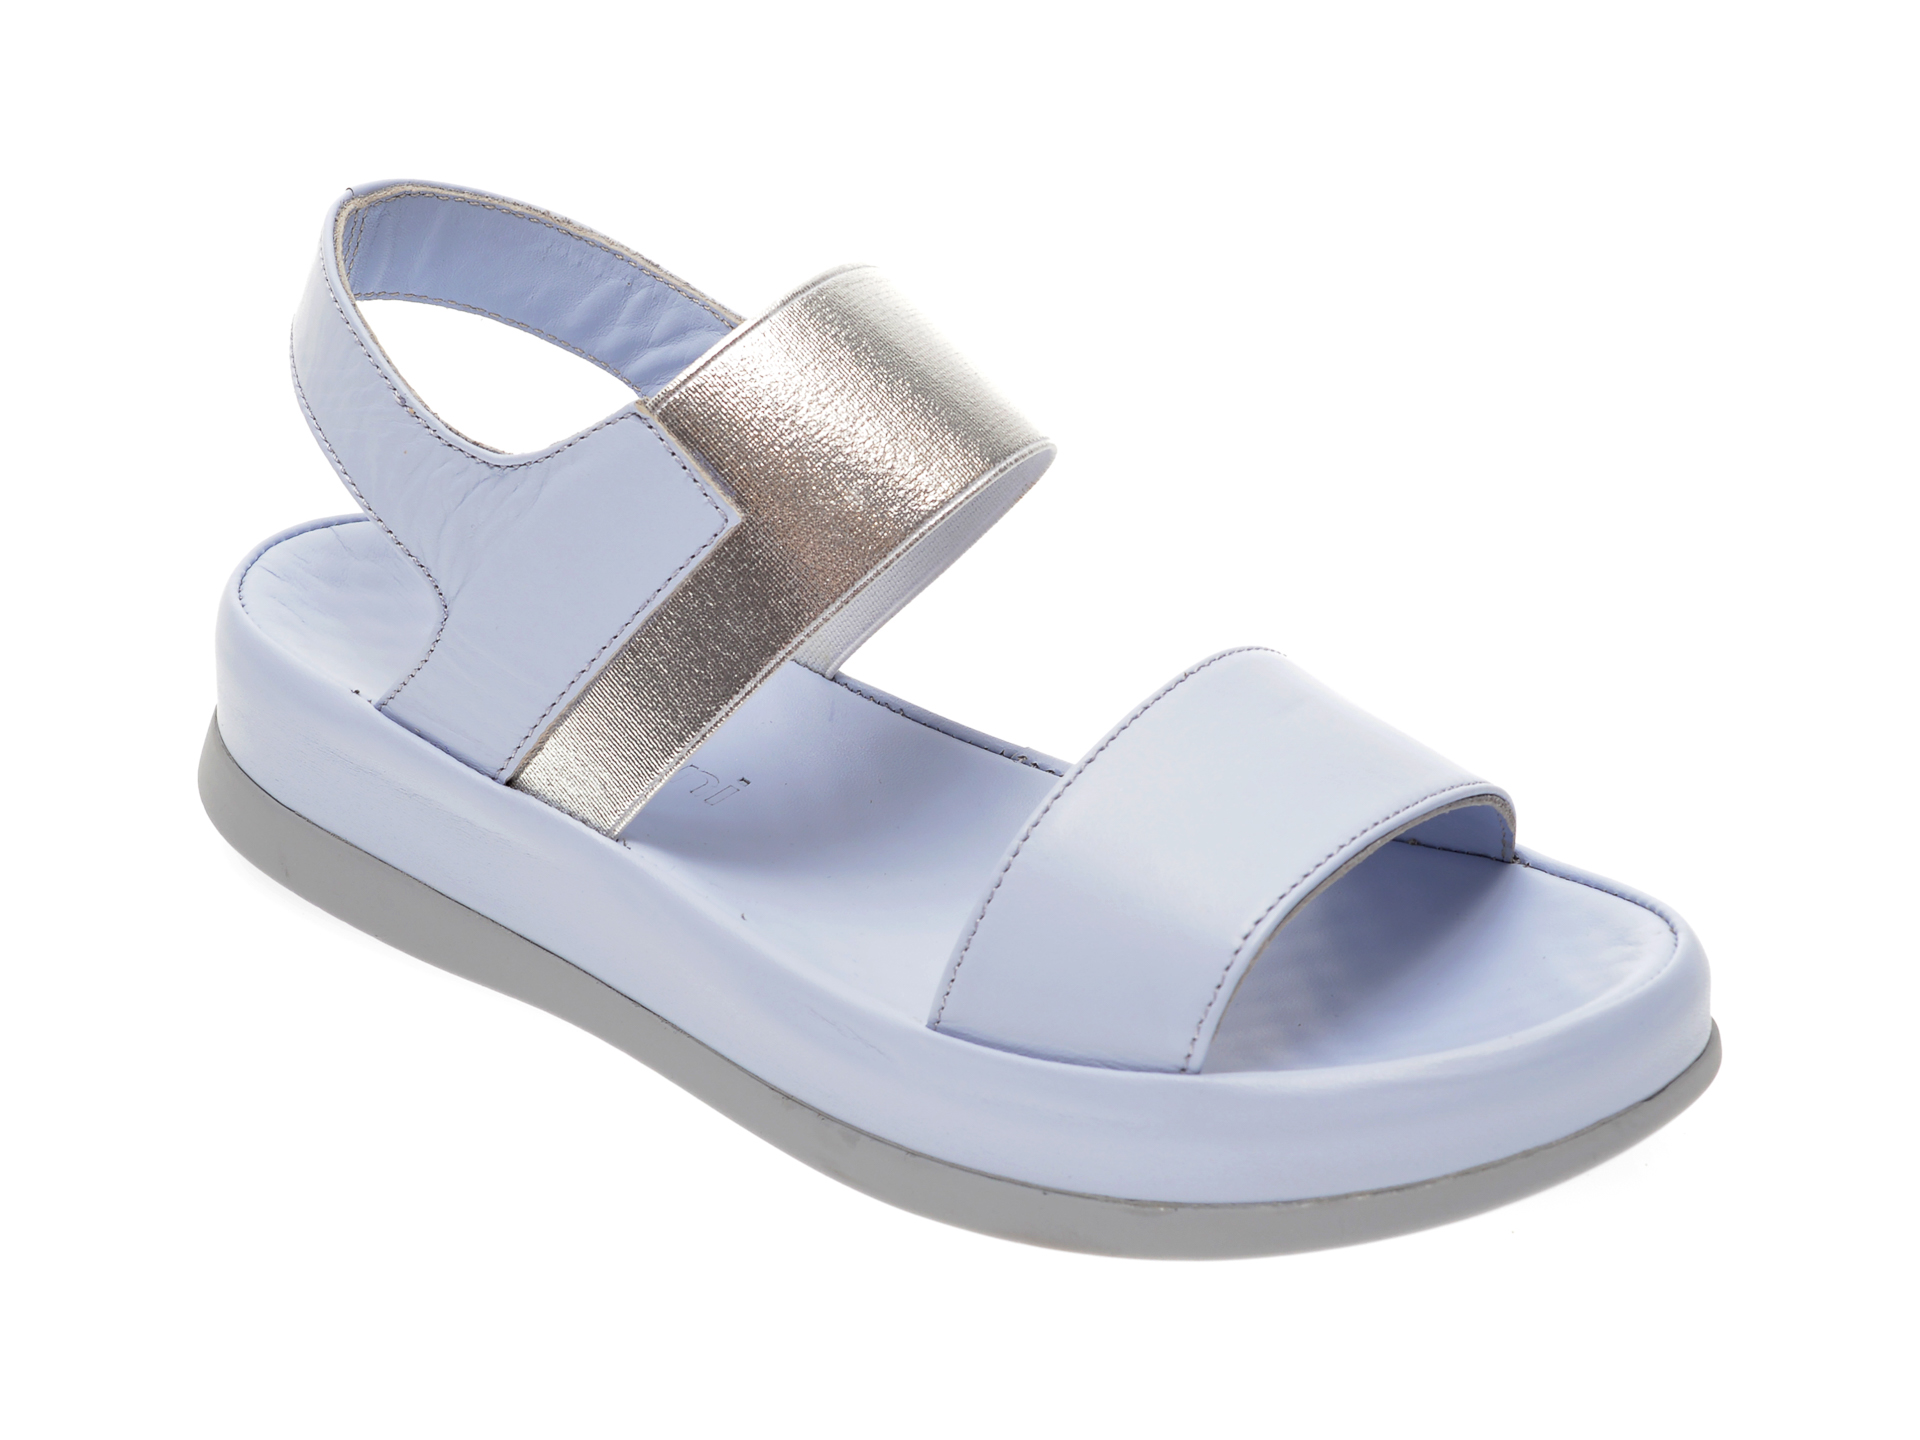 Sandale MISS LIZA albastre, 118PD02, din piele naturala